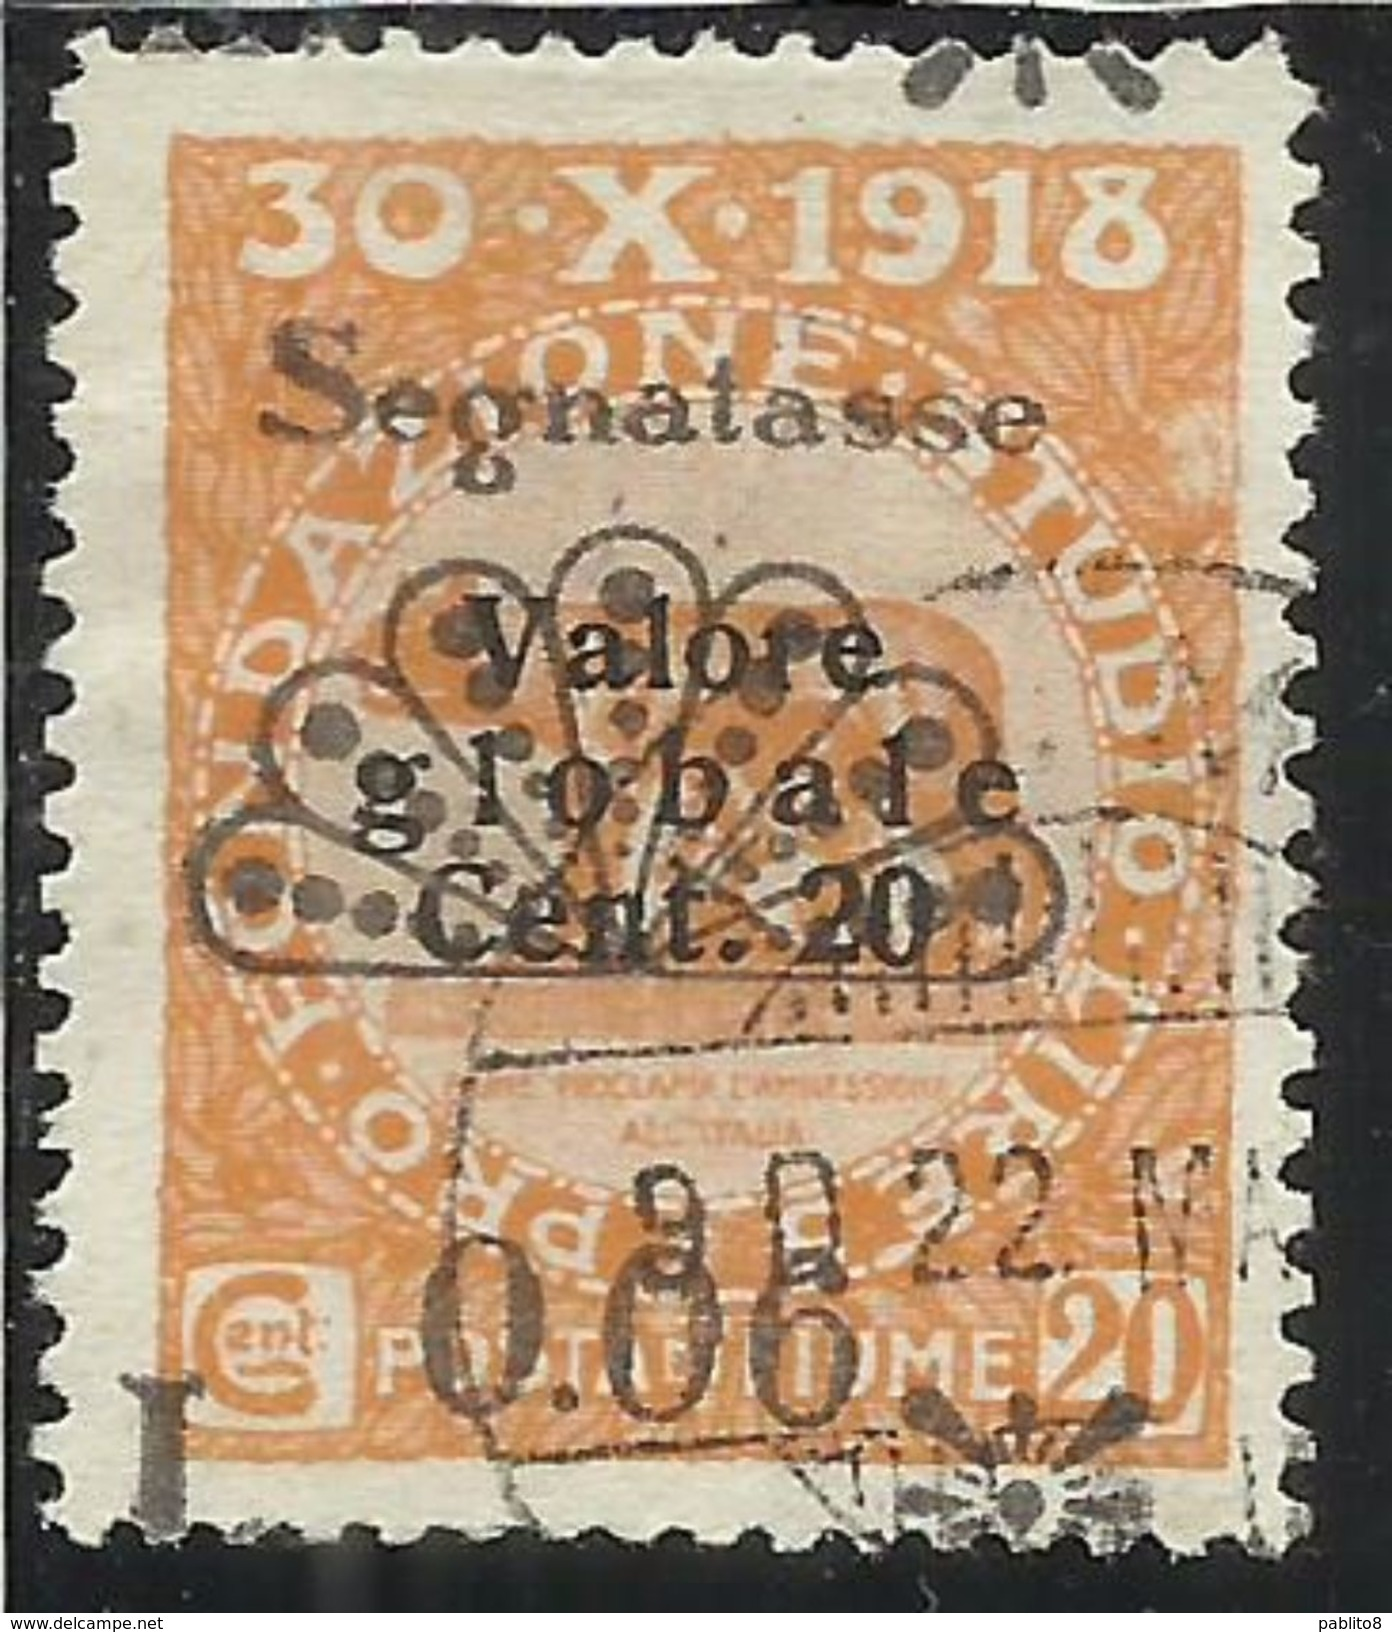 FIUME 1921 VARIETA' VARIETY SEGNATASSE POSTAGE DUE TASSE TAXE VALORE GLOBALE 2° TIPO 0.06 SU CENT. 20c USATO USED - Fiume